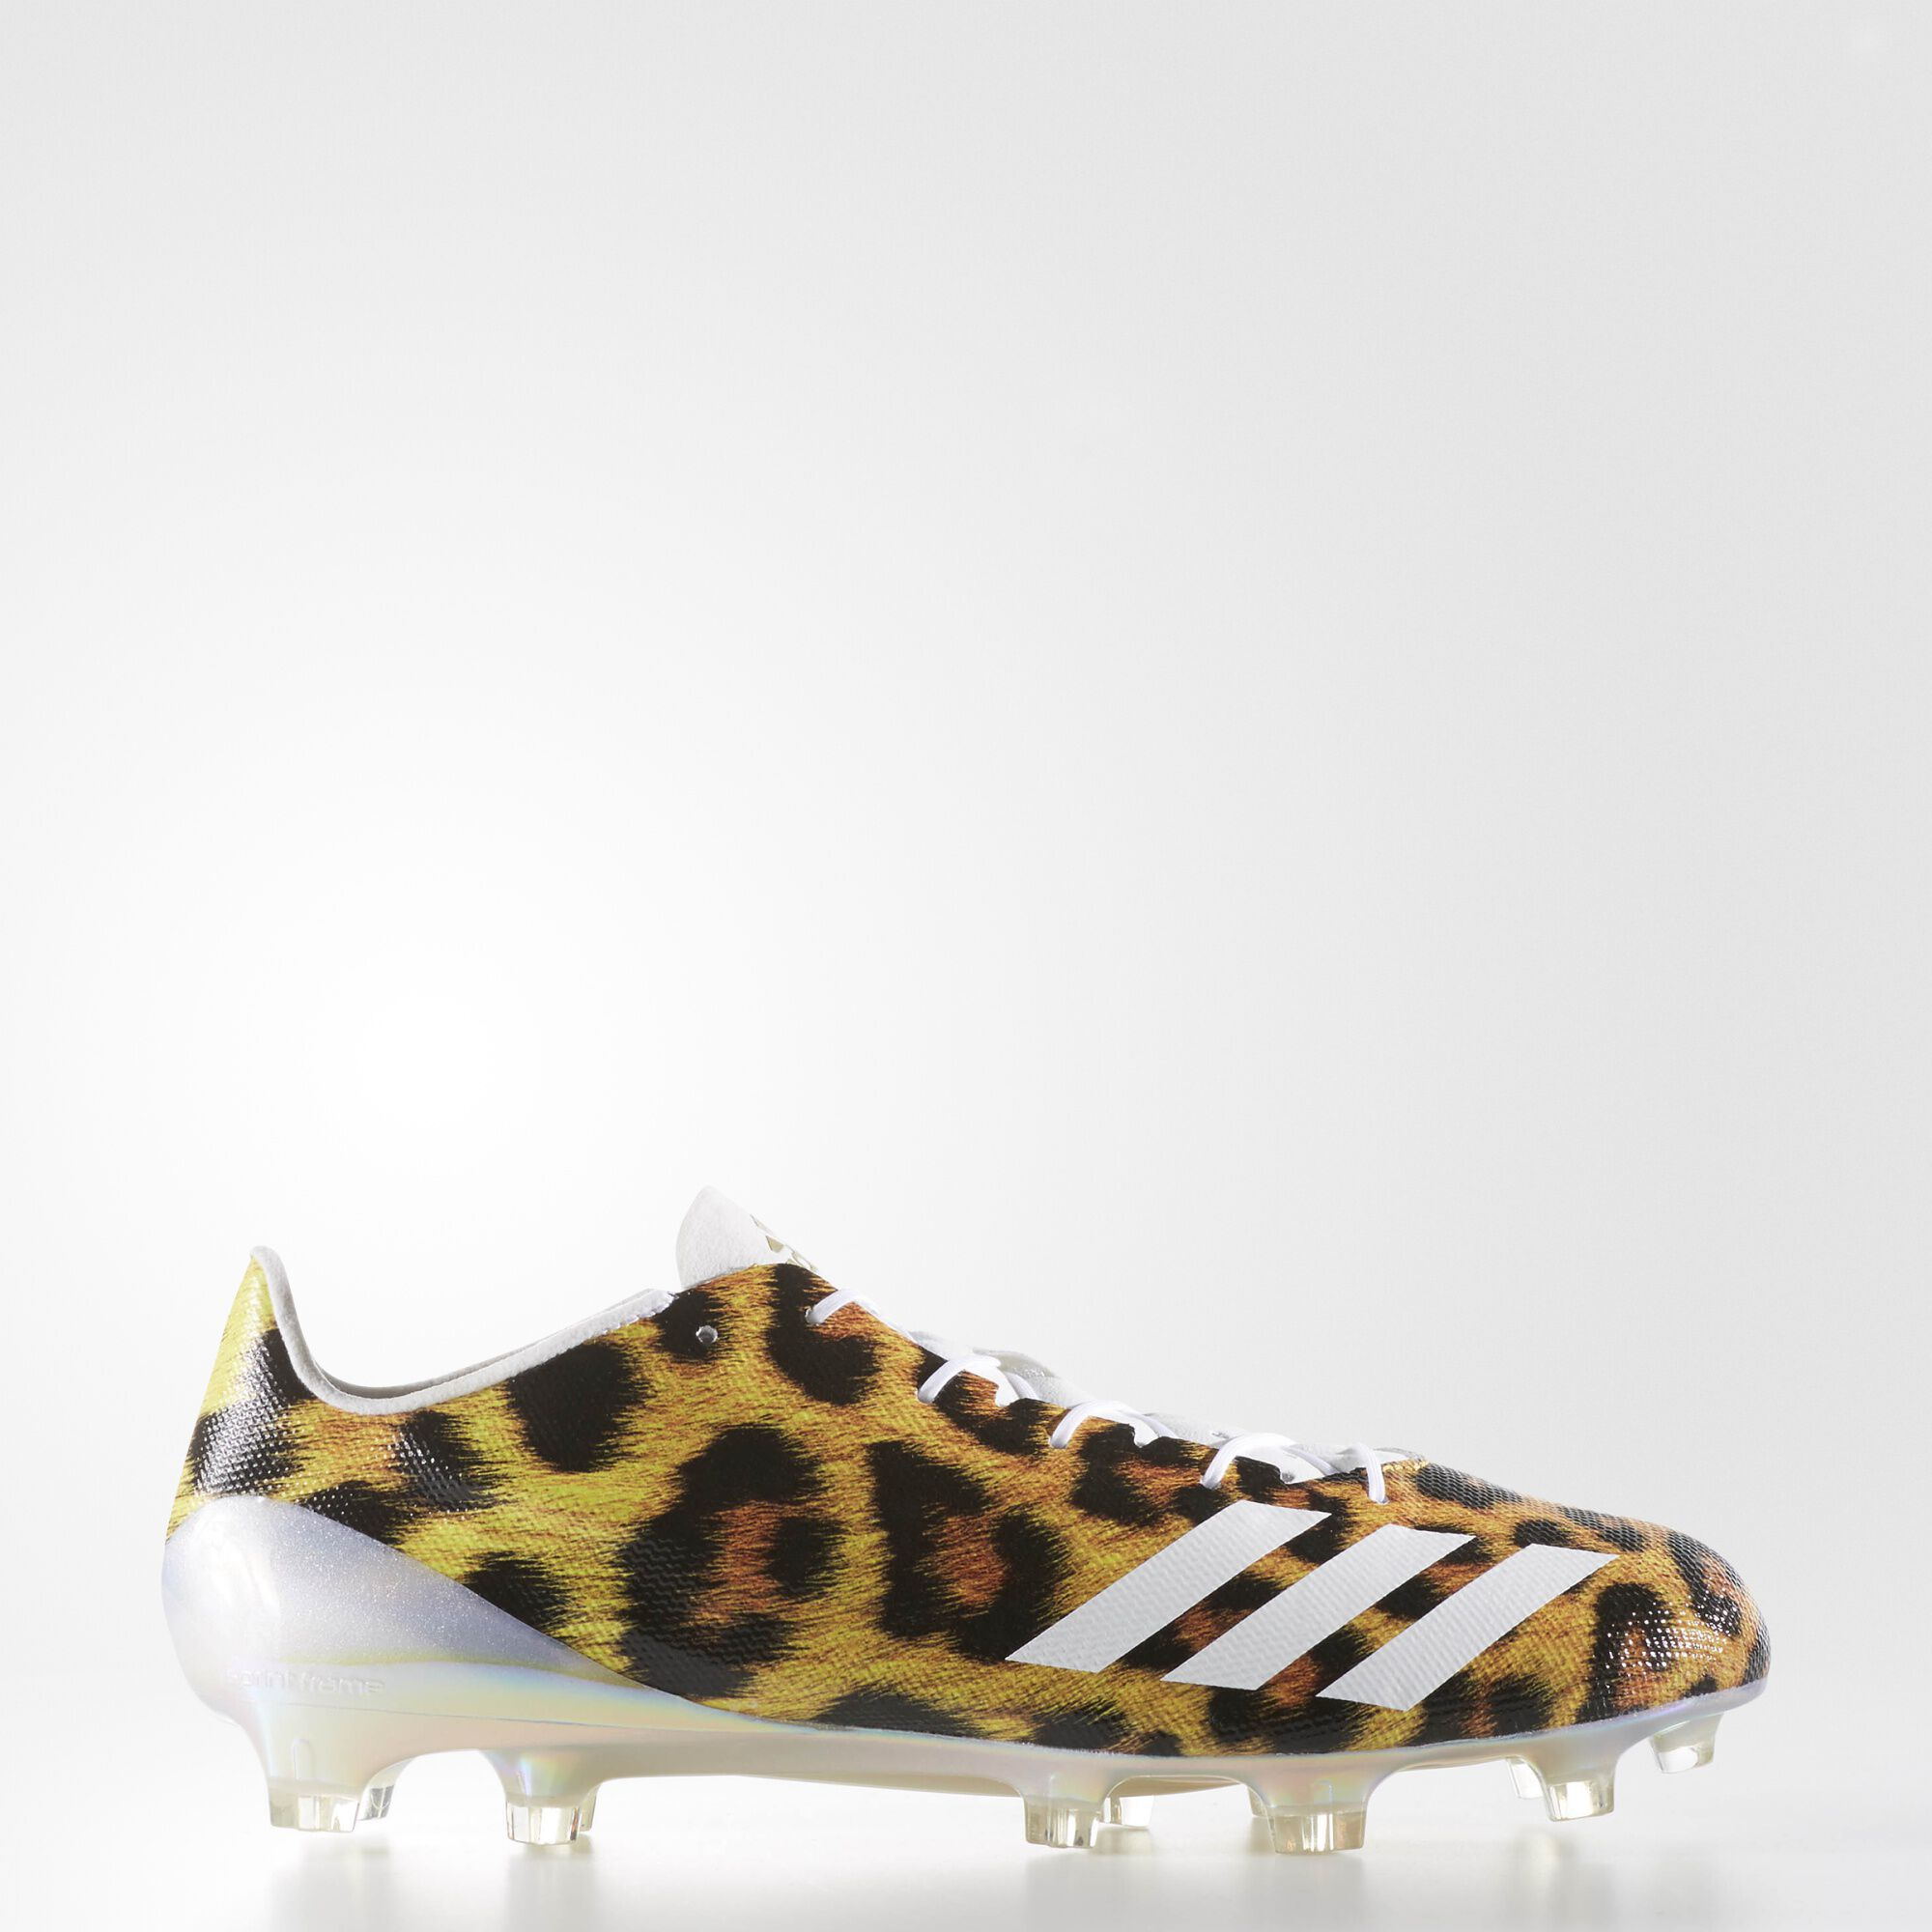 Adidas Football Cleats Cheetah